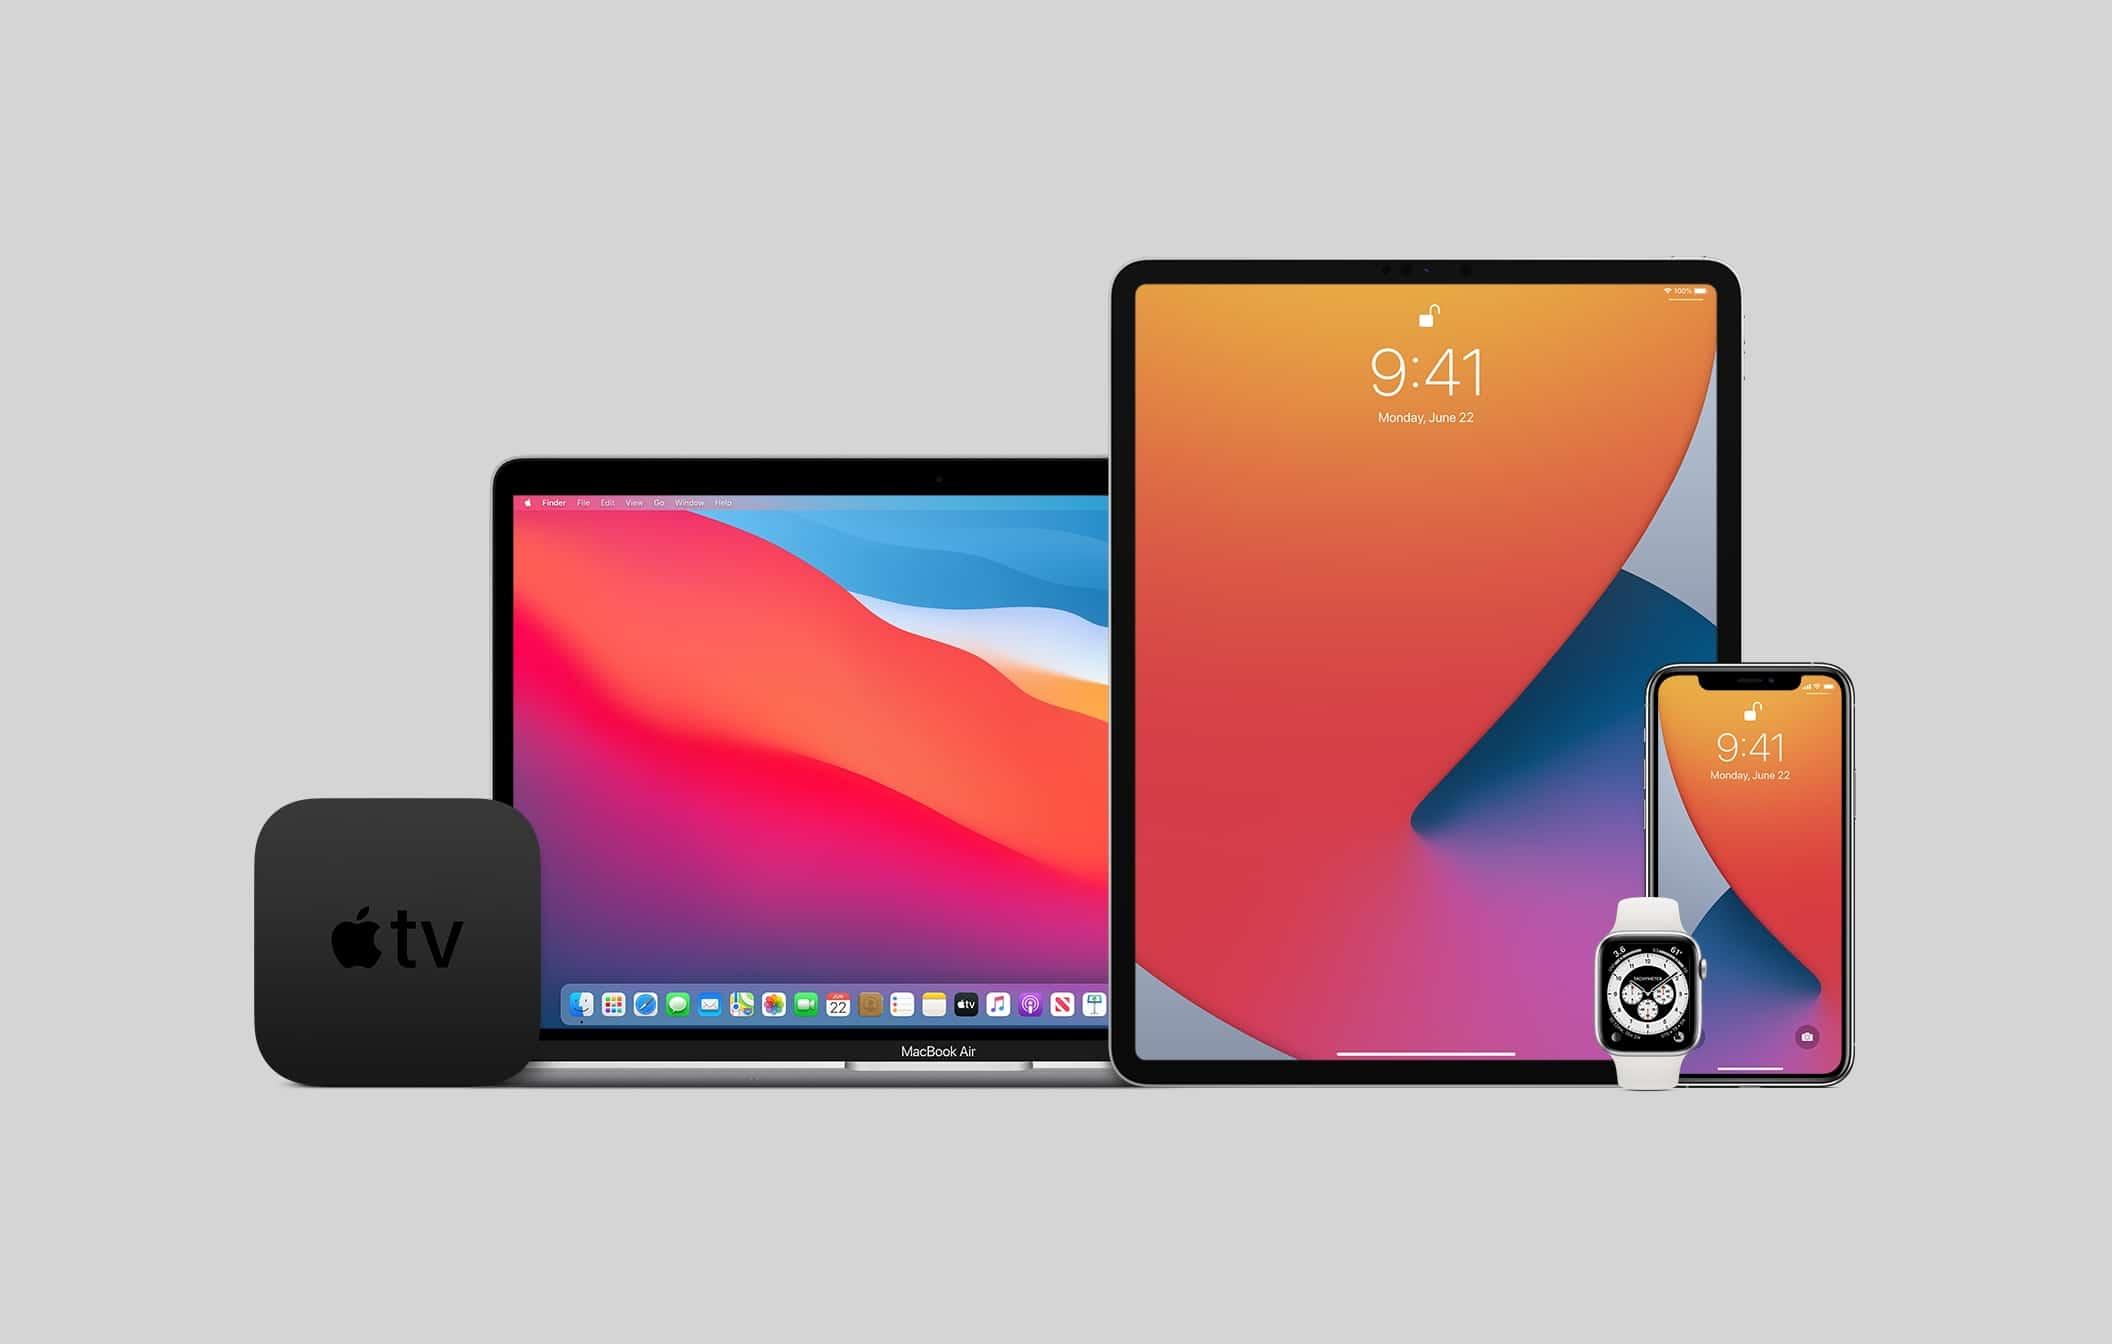 Produtos da Apple (sistemas beta)